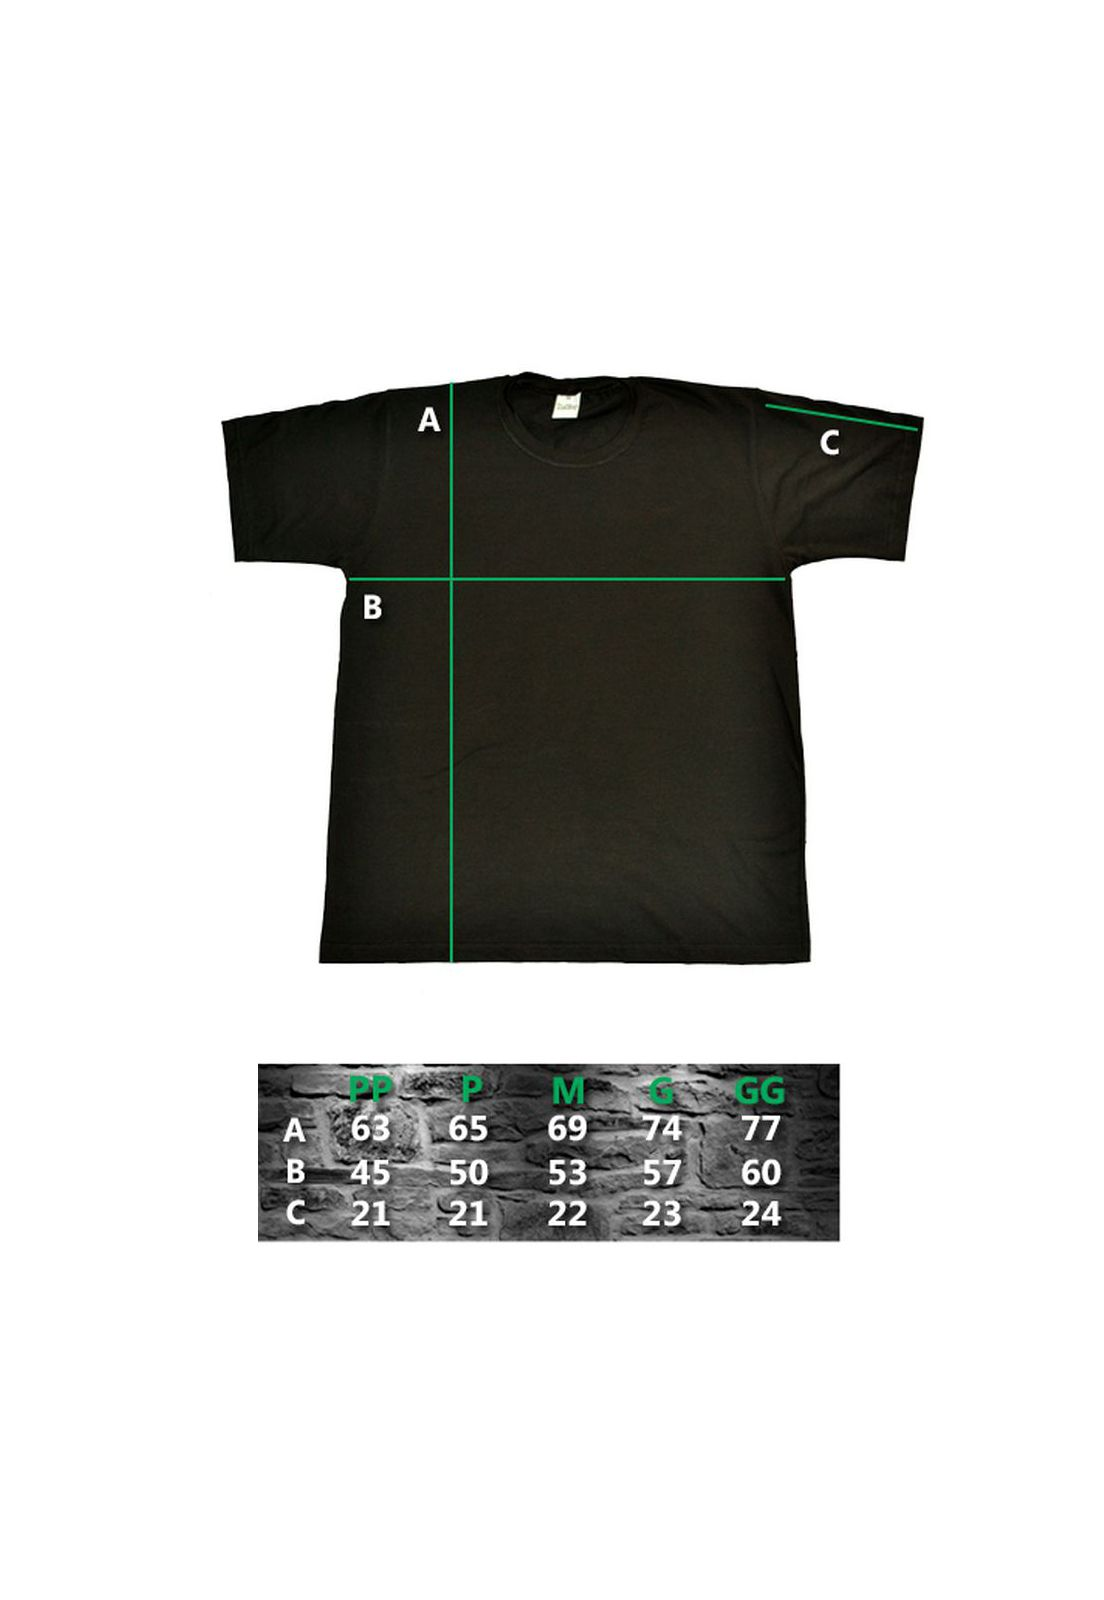 Camiseta HShop Pedal Pushers - Branco  - HShop